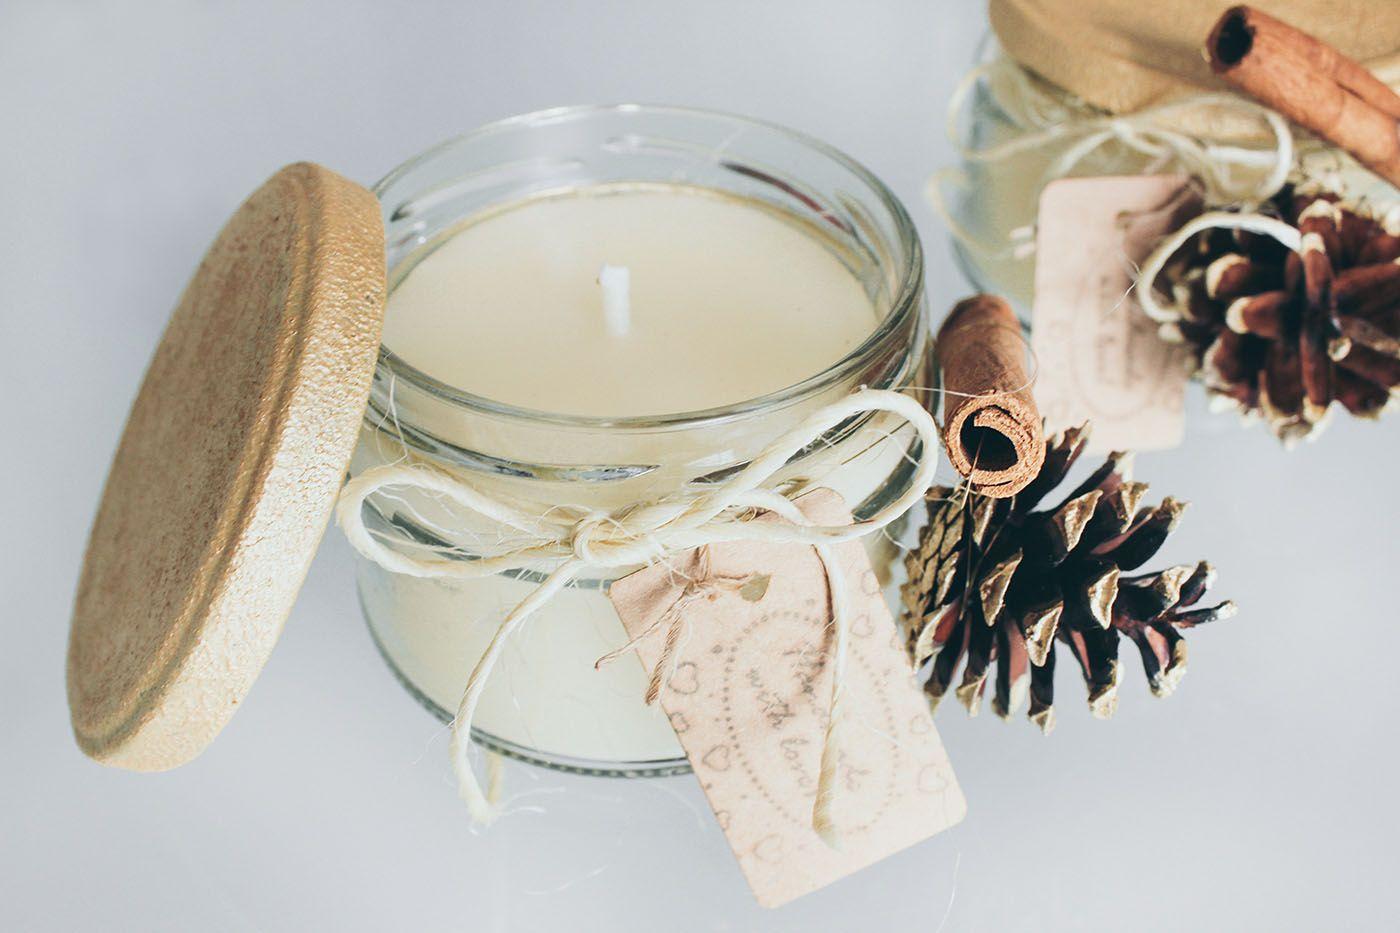 DIY Zimt Kerzen selber machen zu Weihnachten • Yeah Handmade